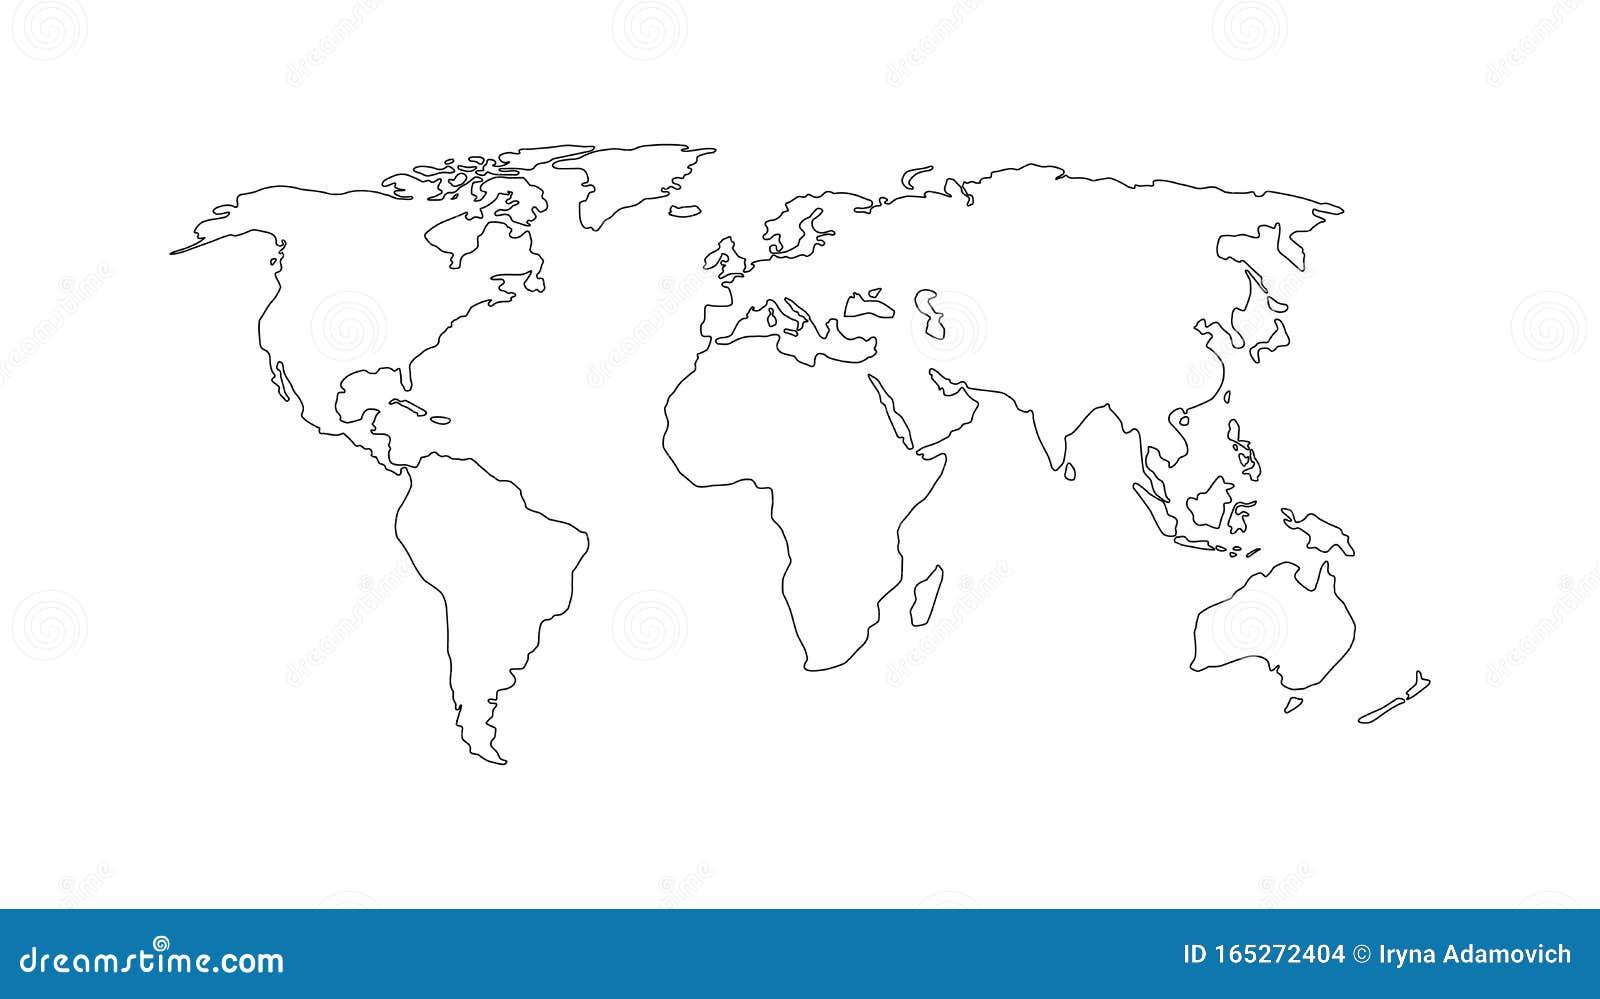 Simple World Map Outline World Map Outline Simple Stock Illustrations – 17,406 World Map